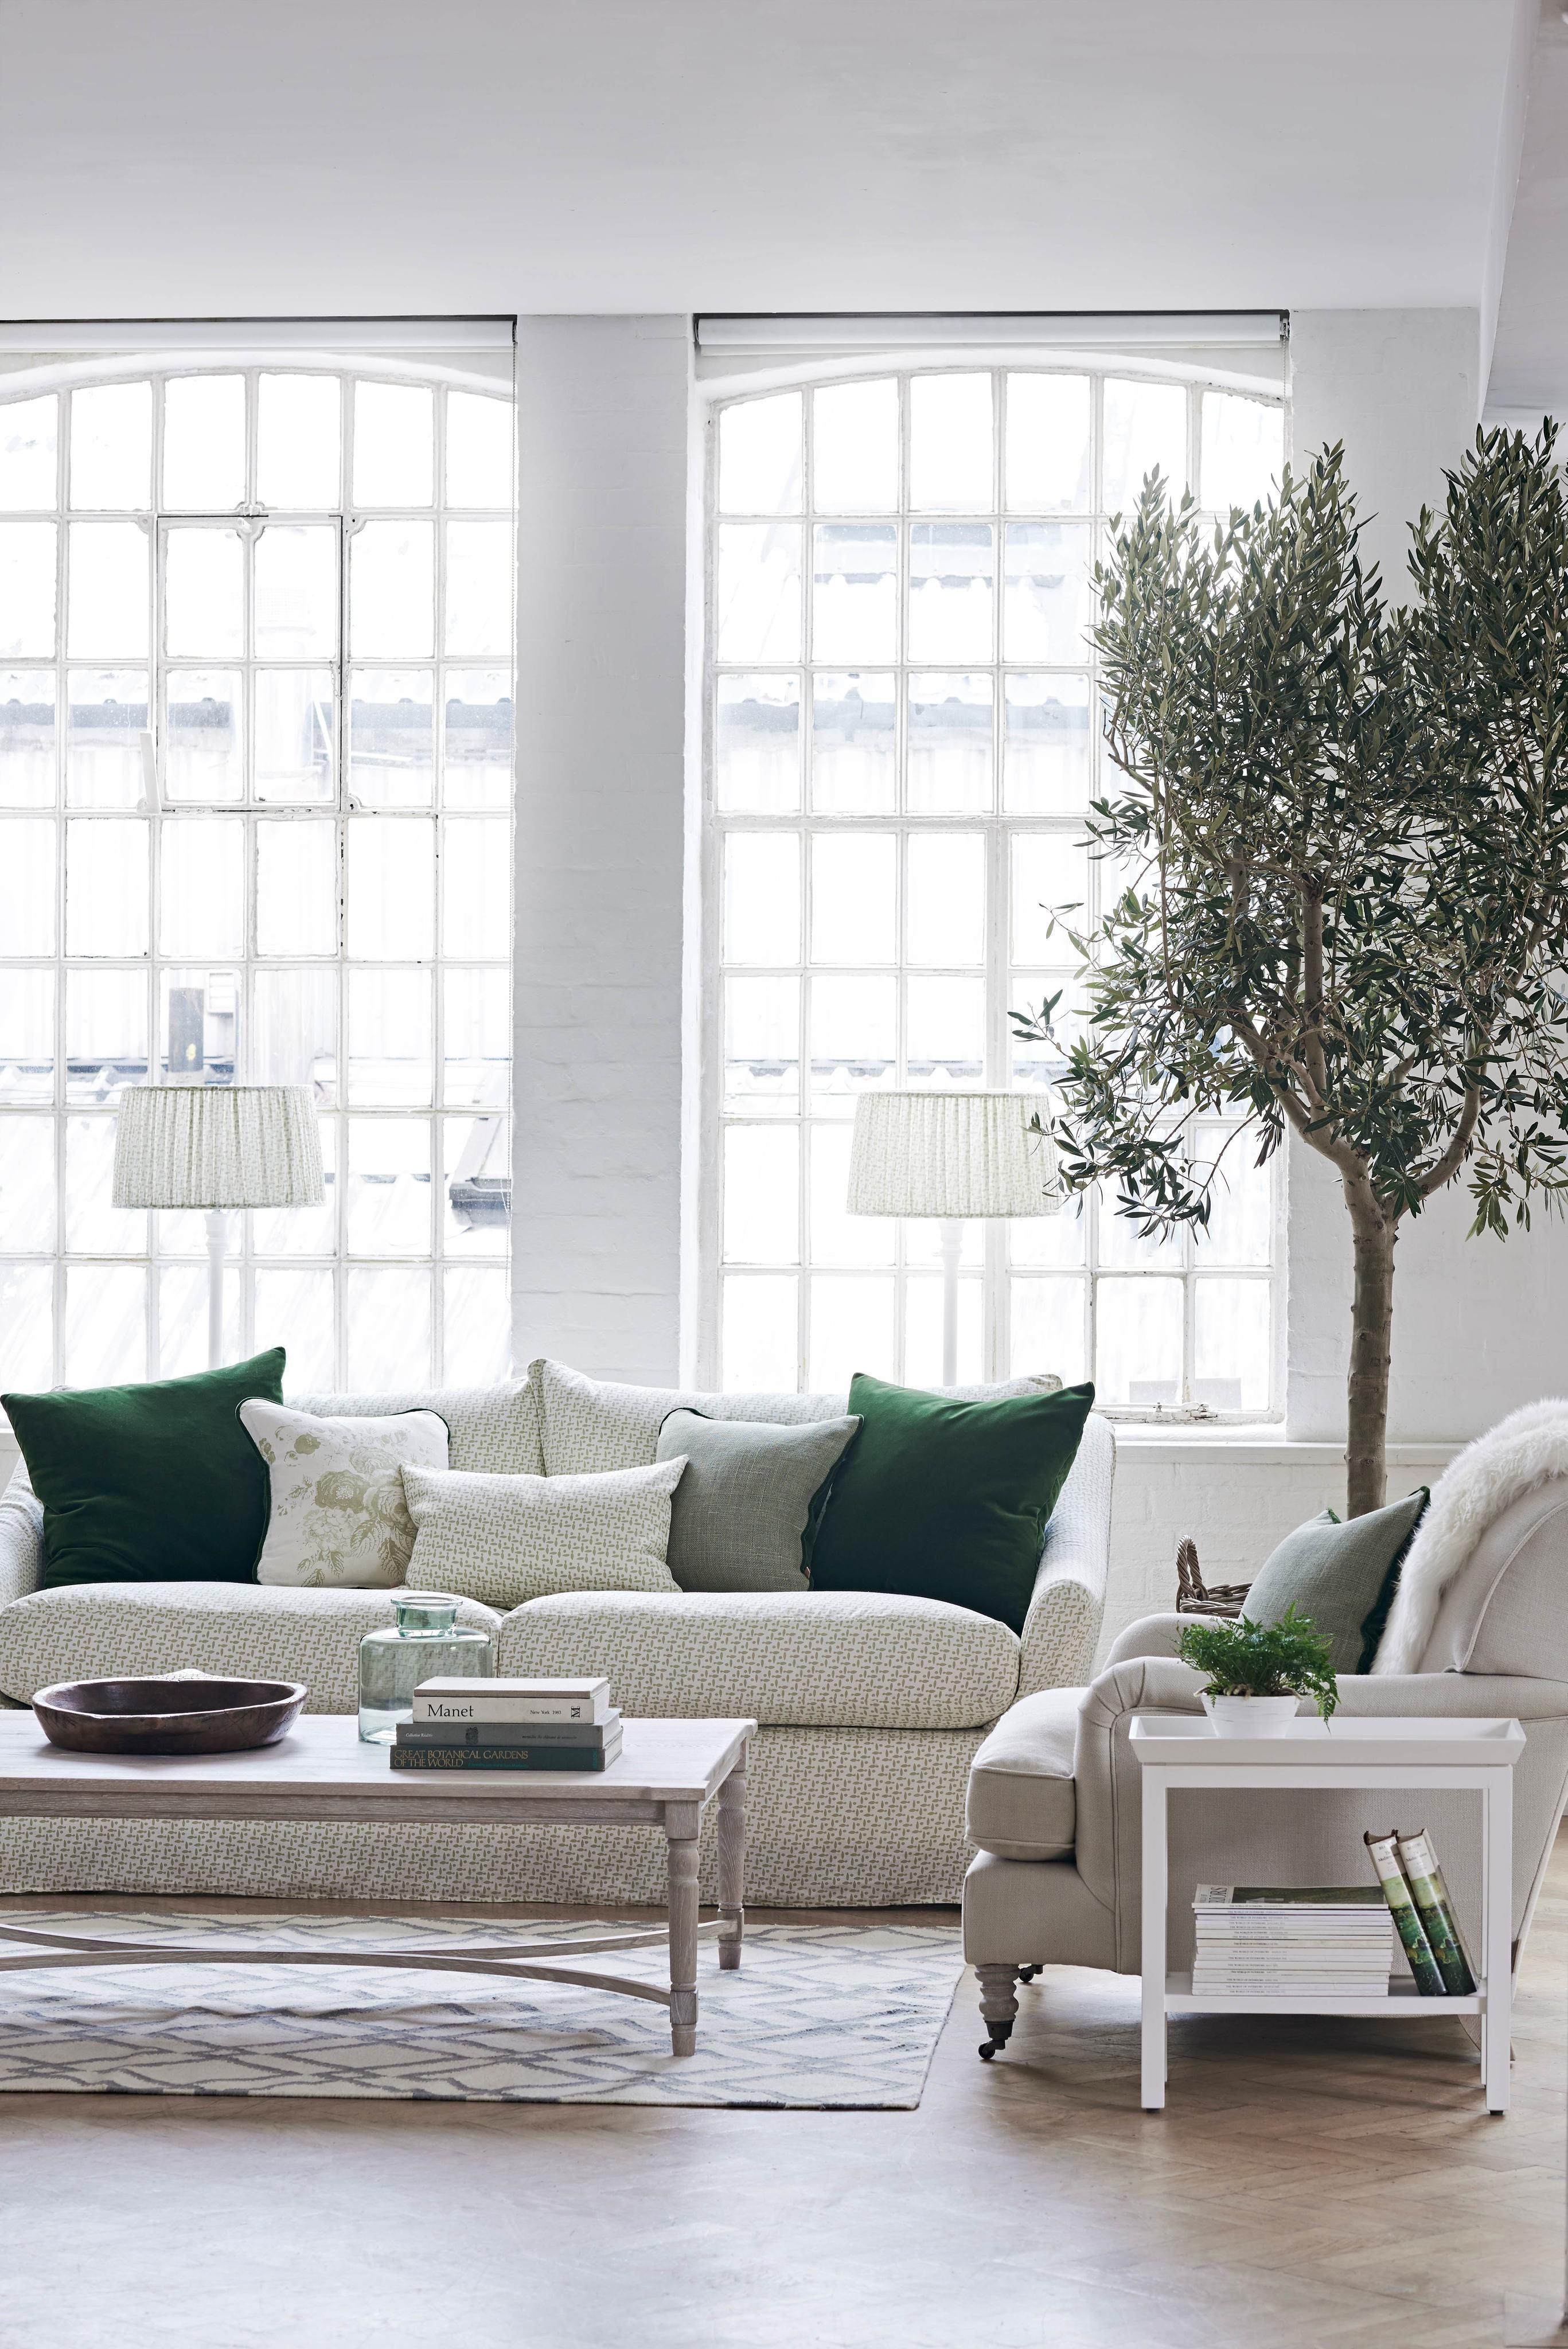 long island sofa neptune mjob blog. Black Bedroom Furniture Sets. Home Design Ideas